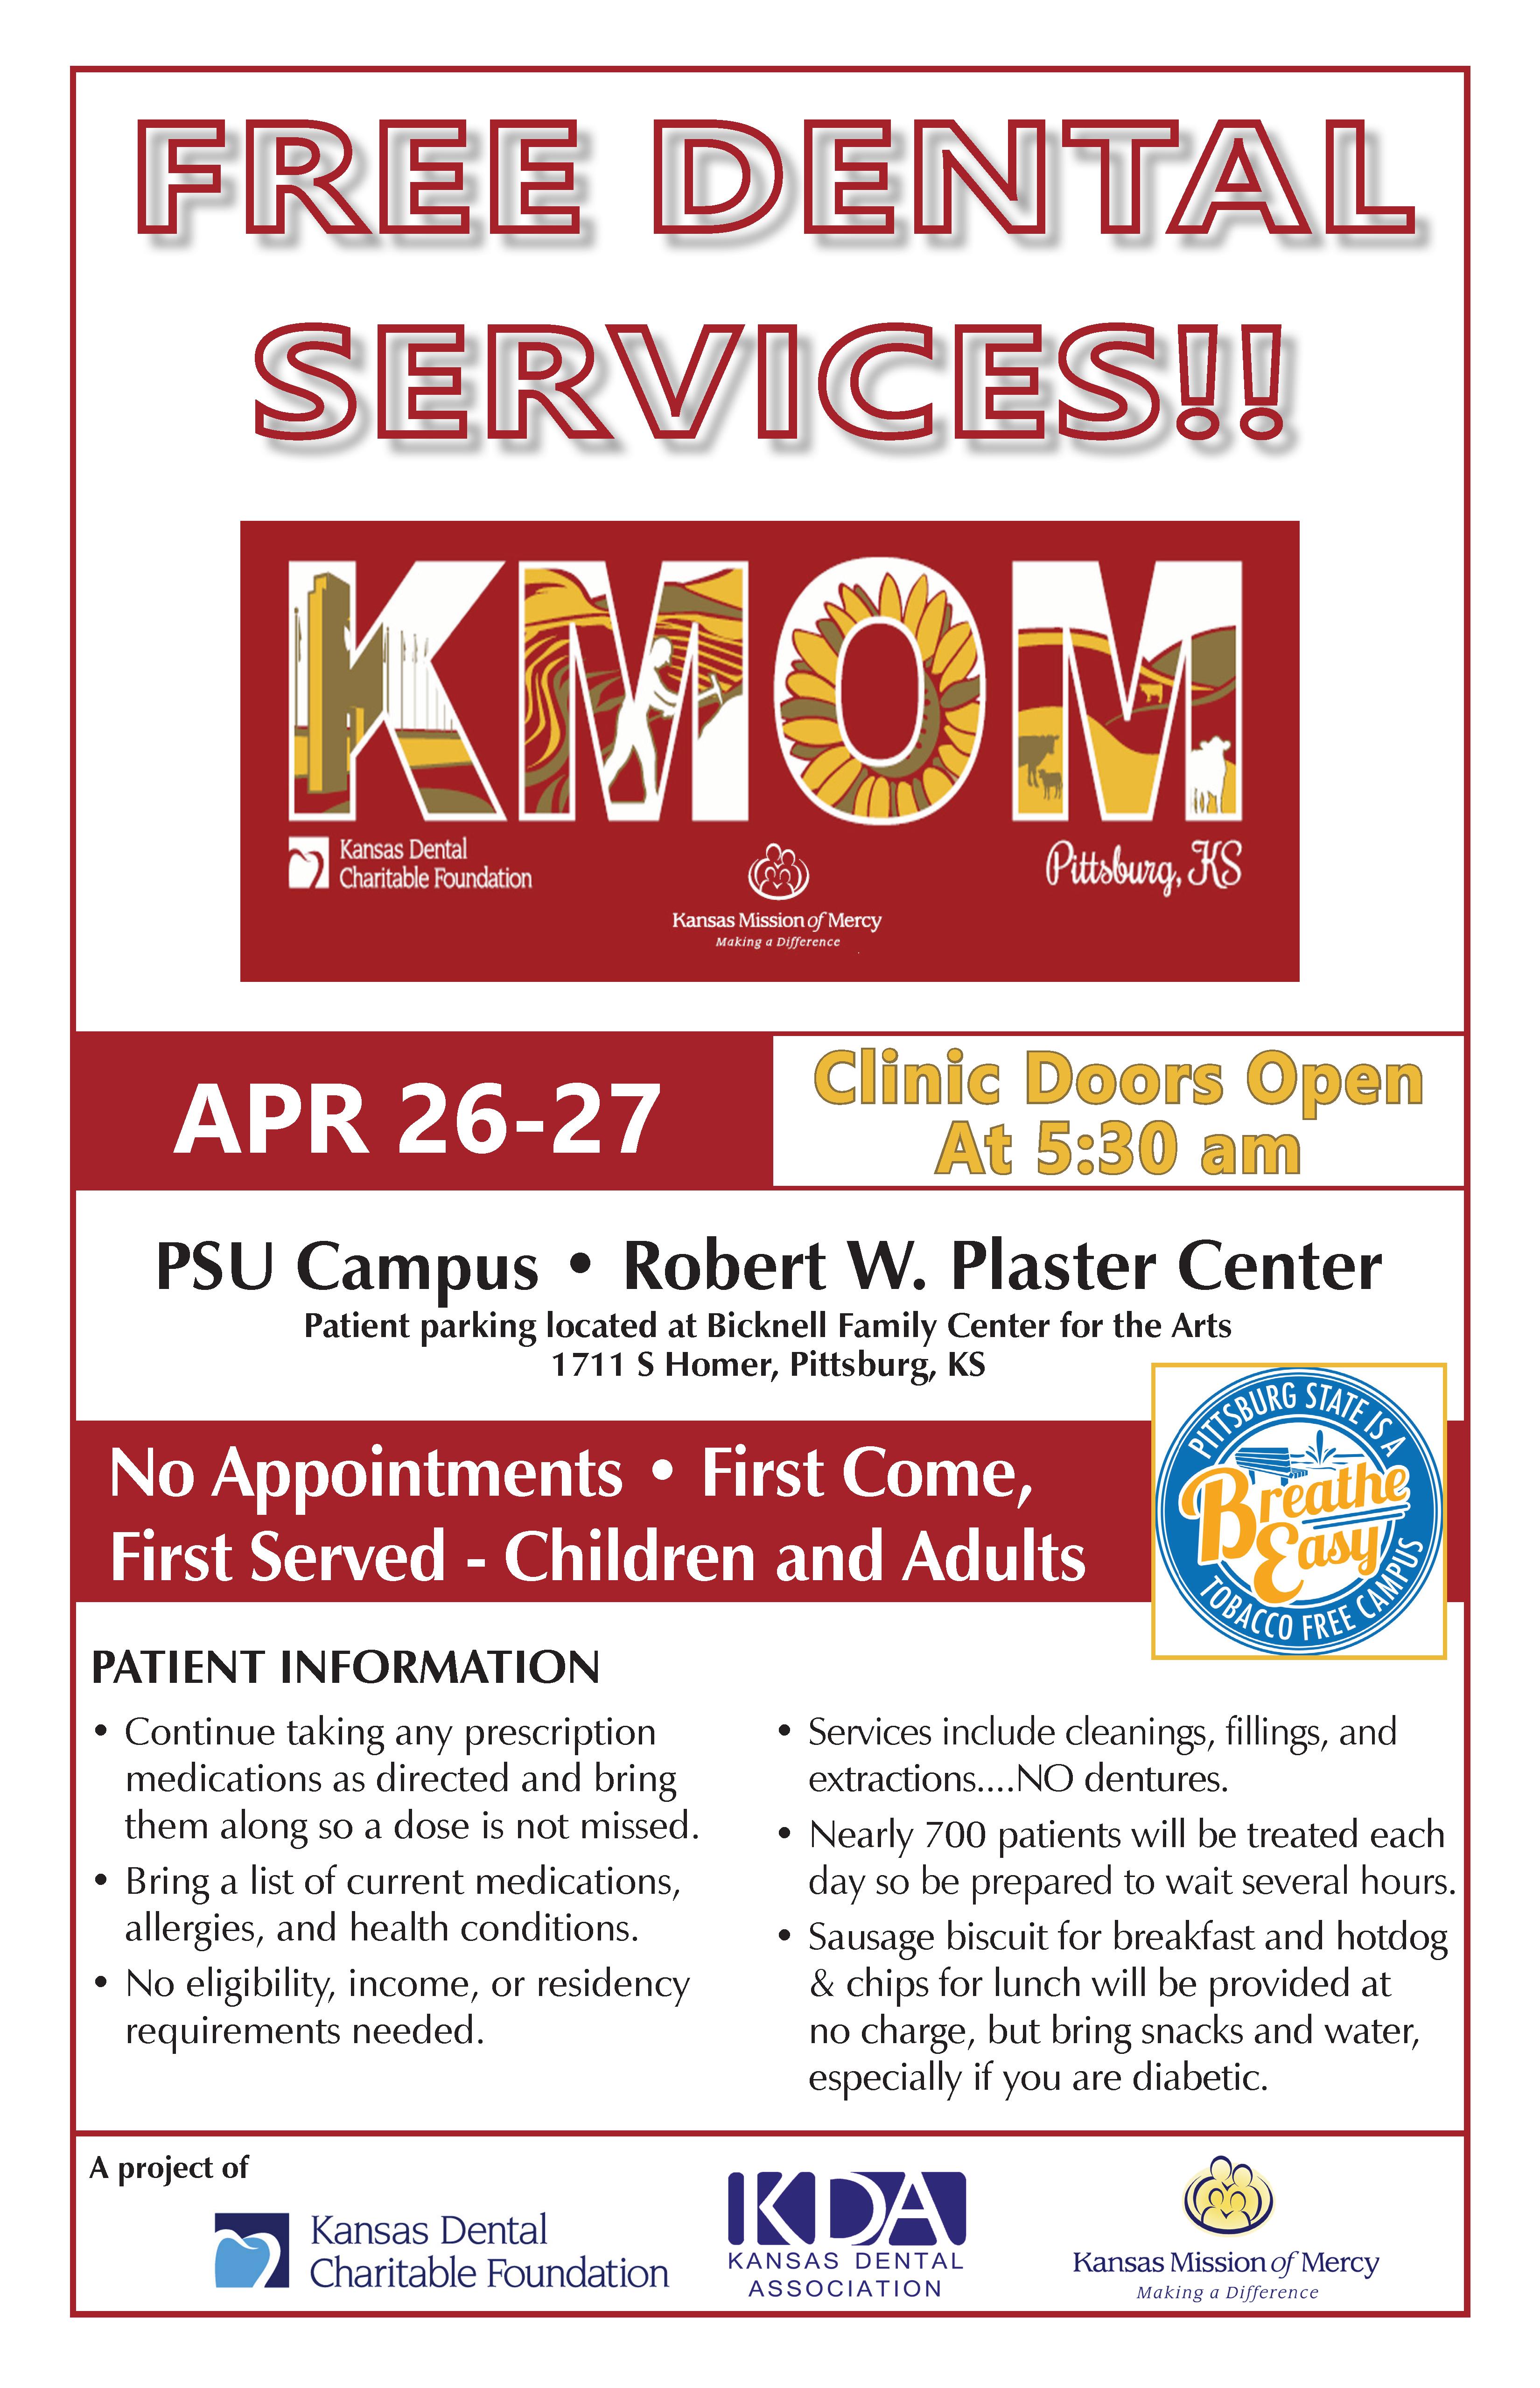 KMOM Media Resources